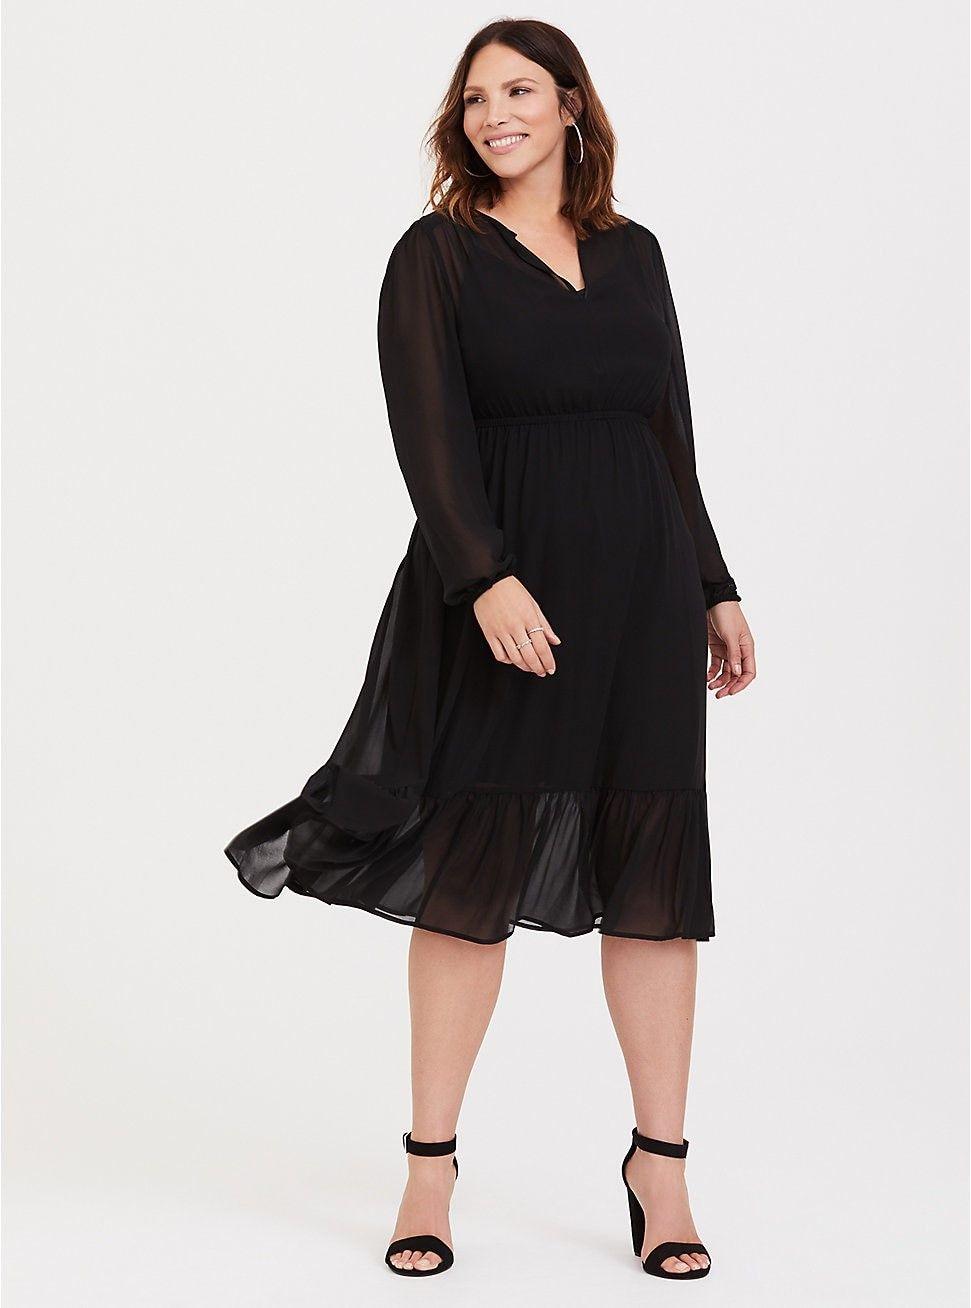 Black Chiffon Midi Dress Chiffon midi dress, Plus size